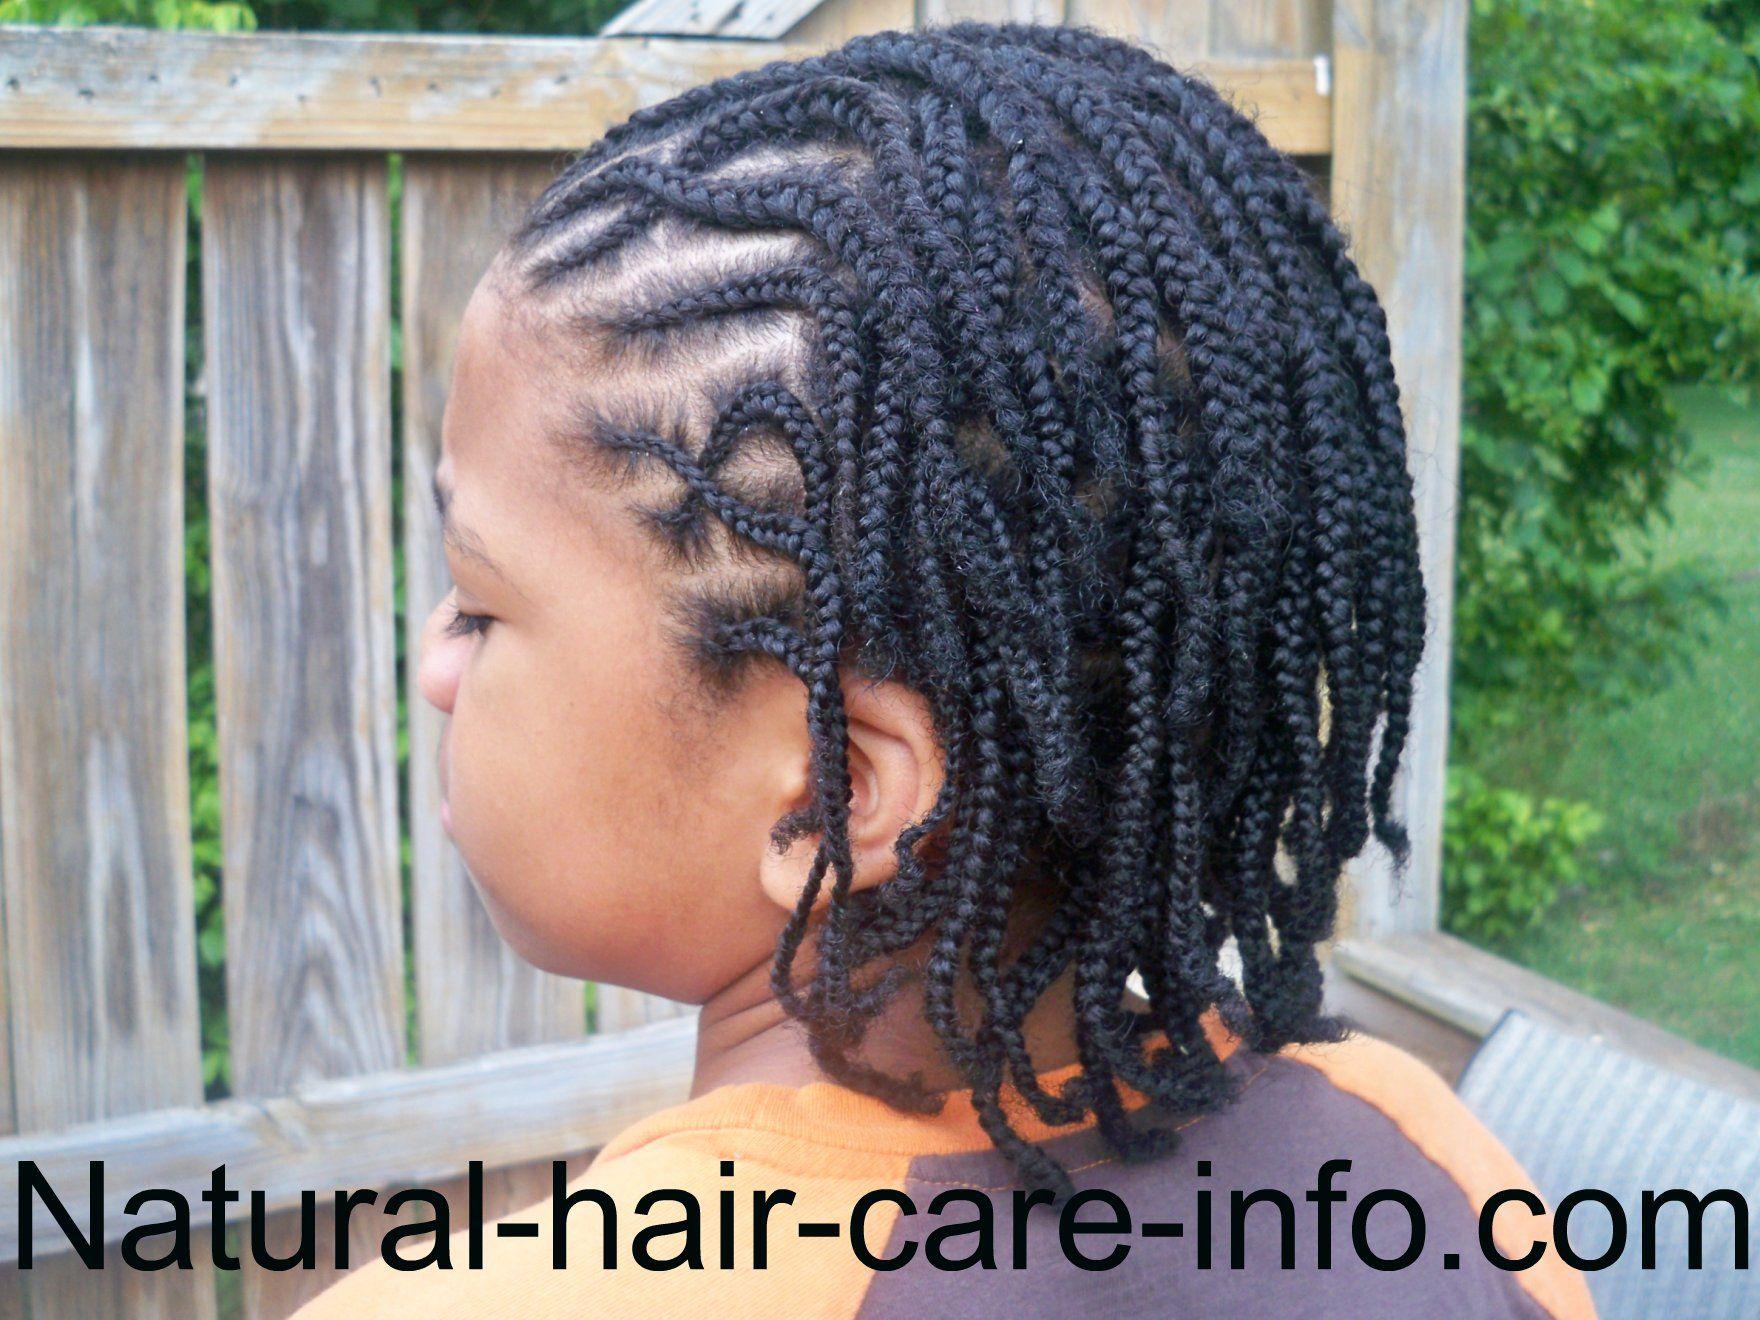 braid hairstyles for men - complete list and tutorials | braids#1